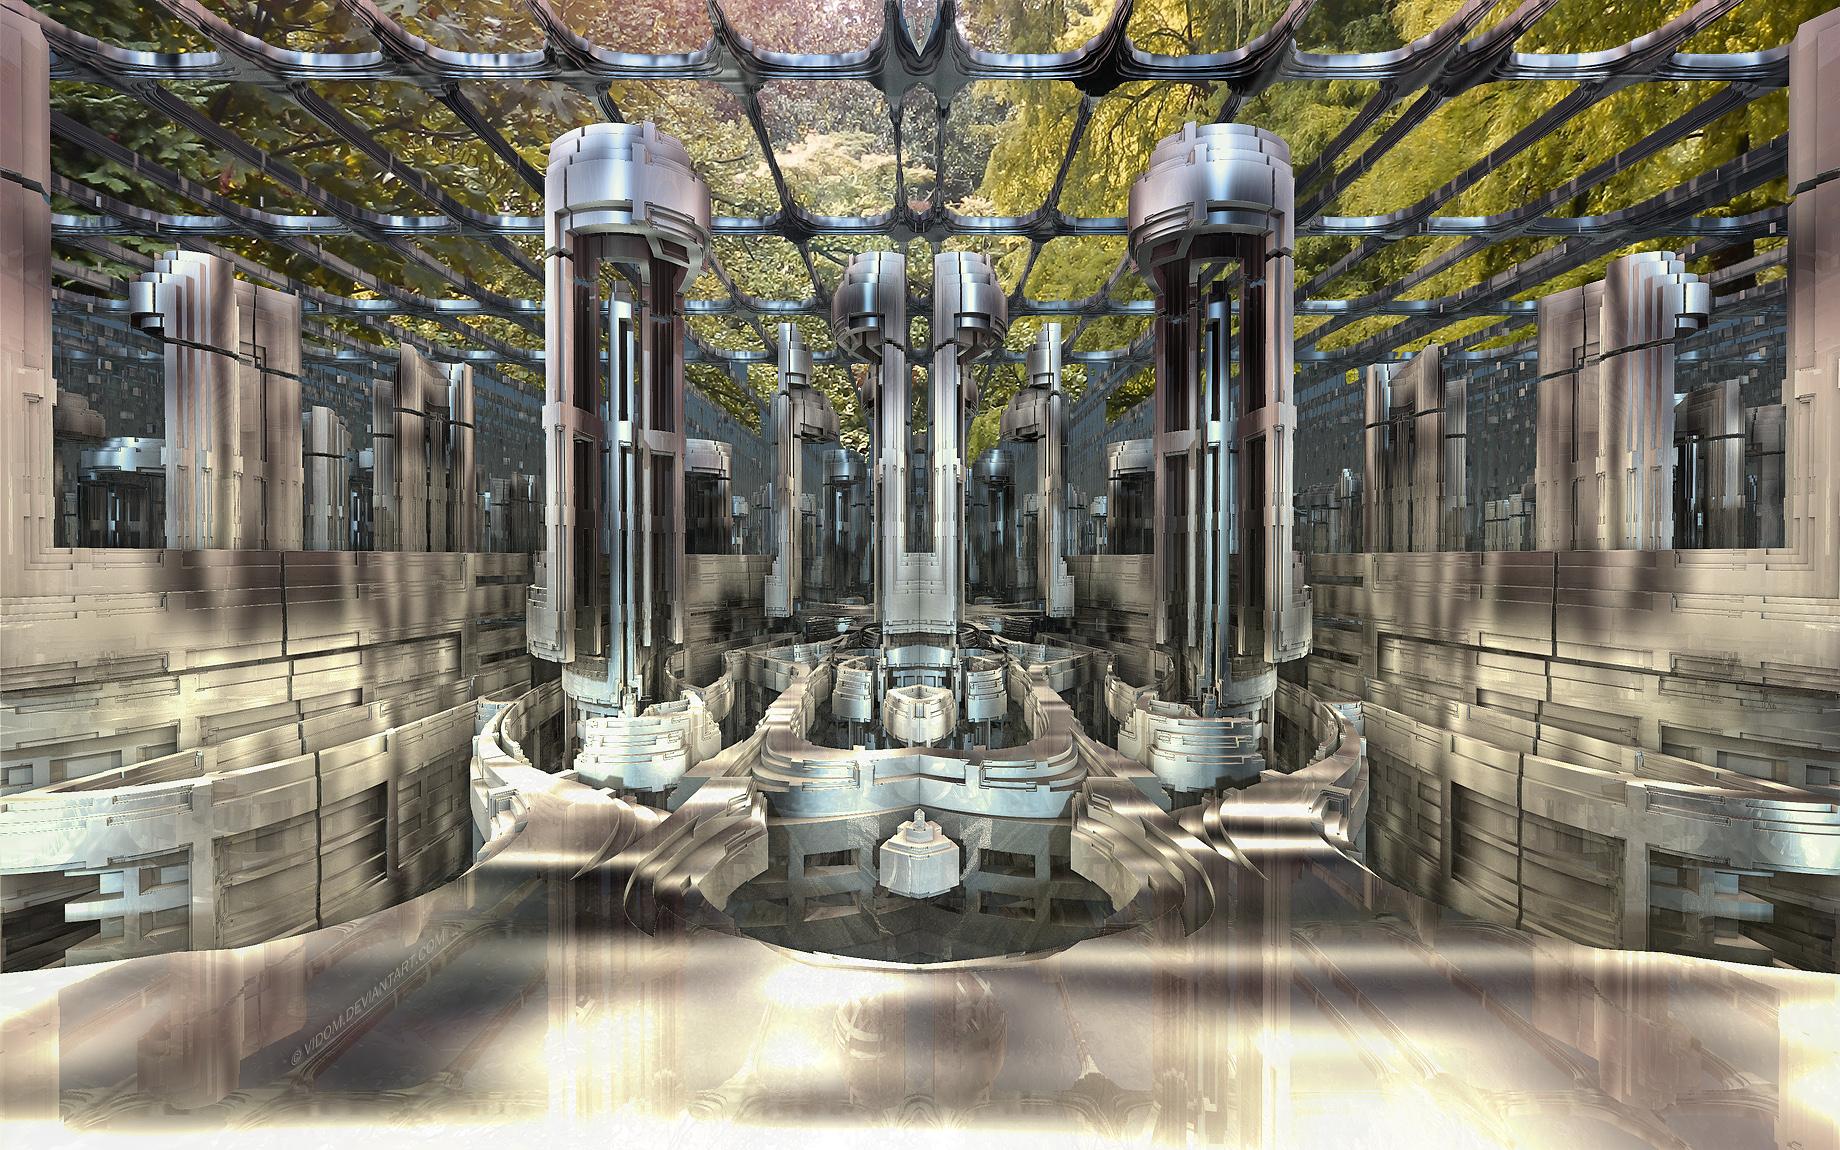 Arboretum Control Center by Vidom